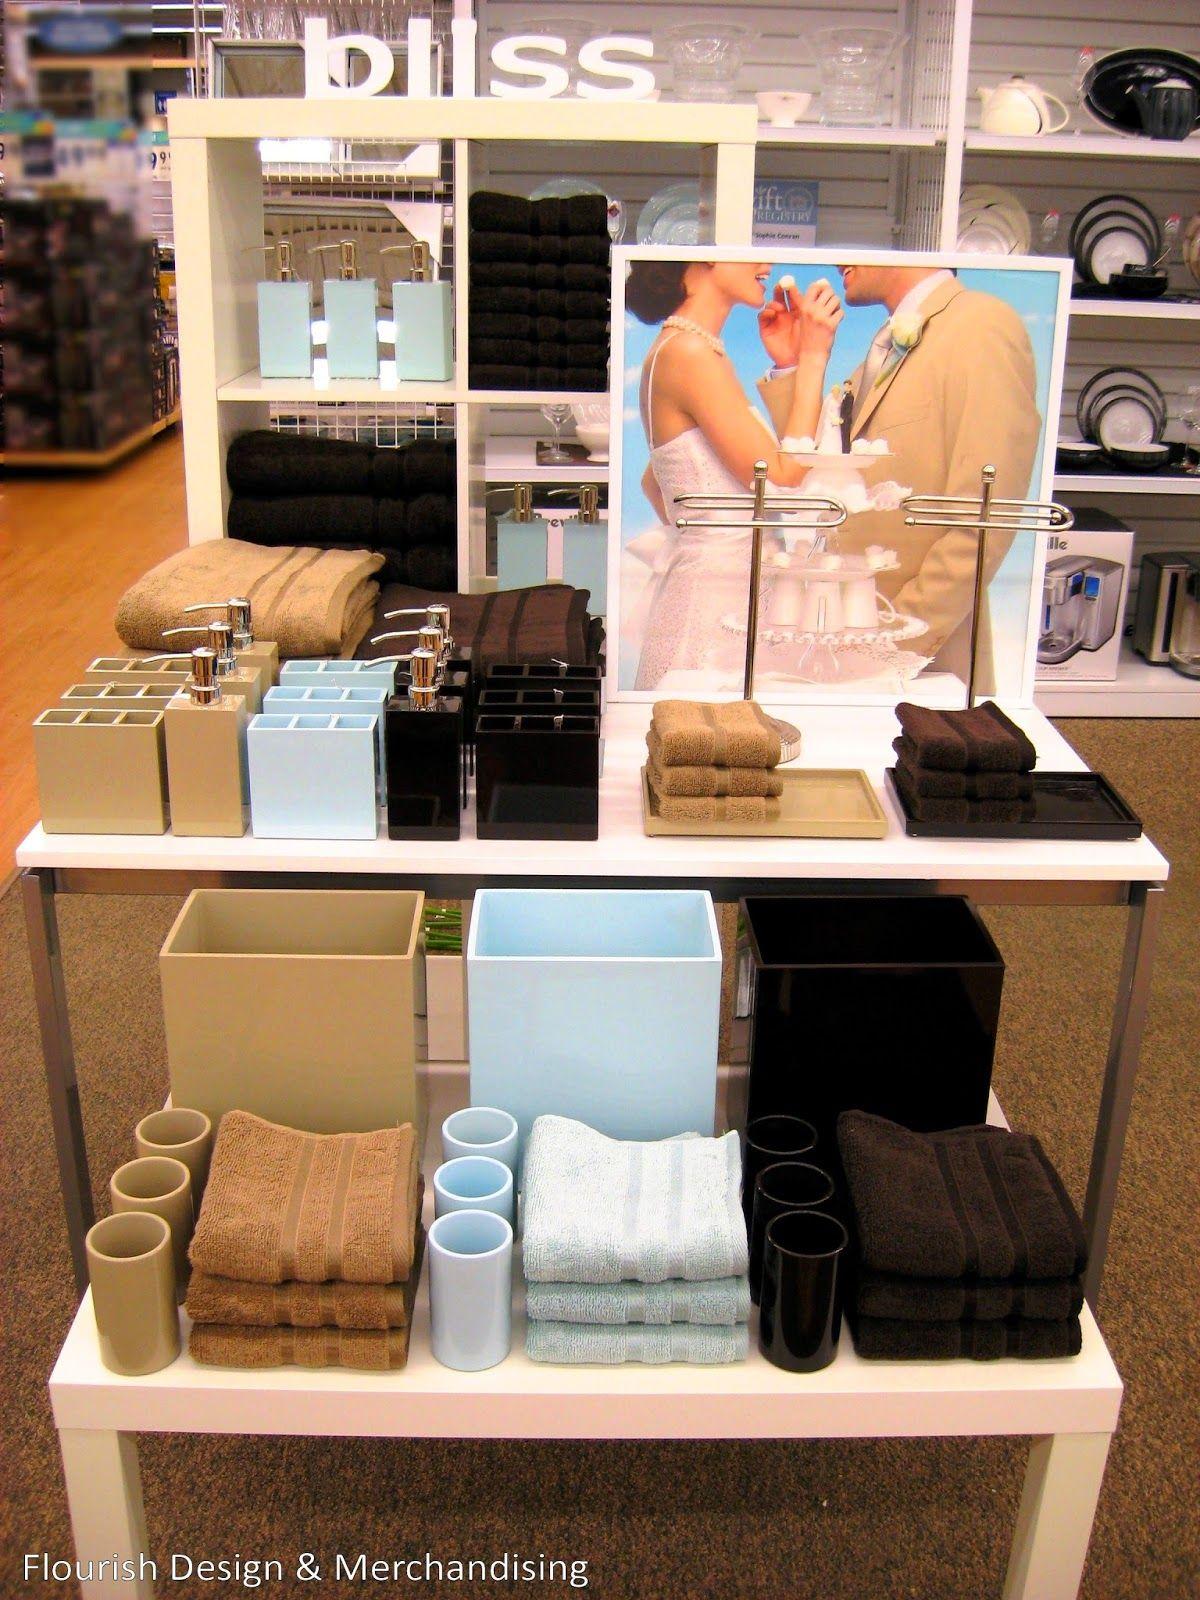 Spring Fever Visual merchandising displays, Towel